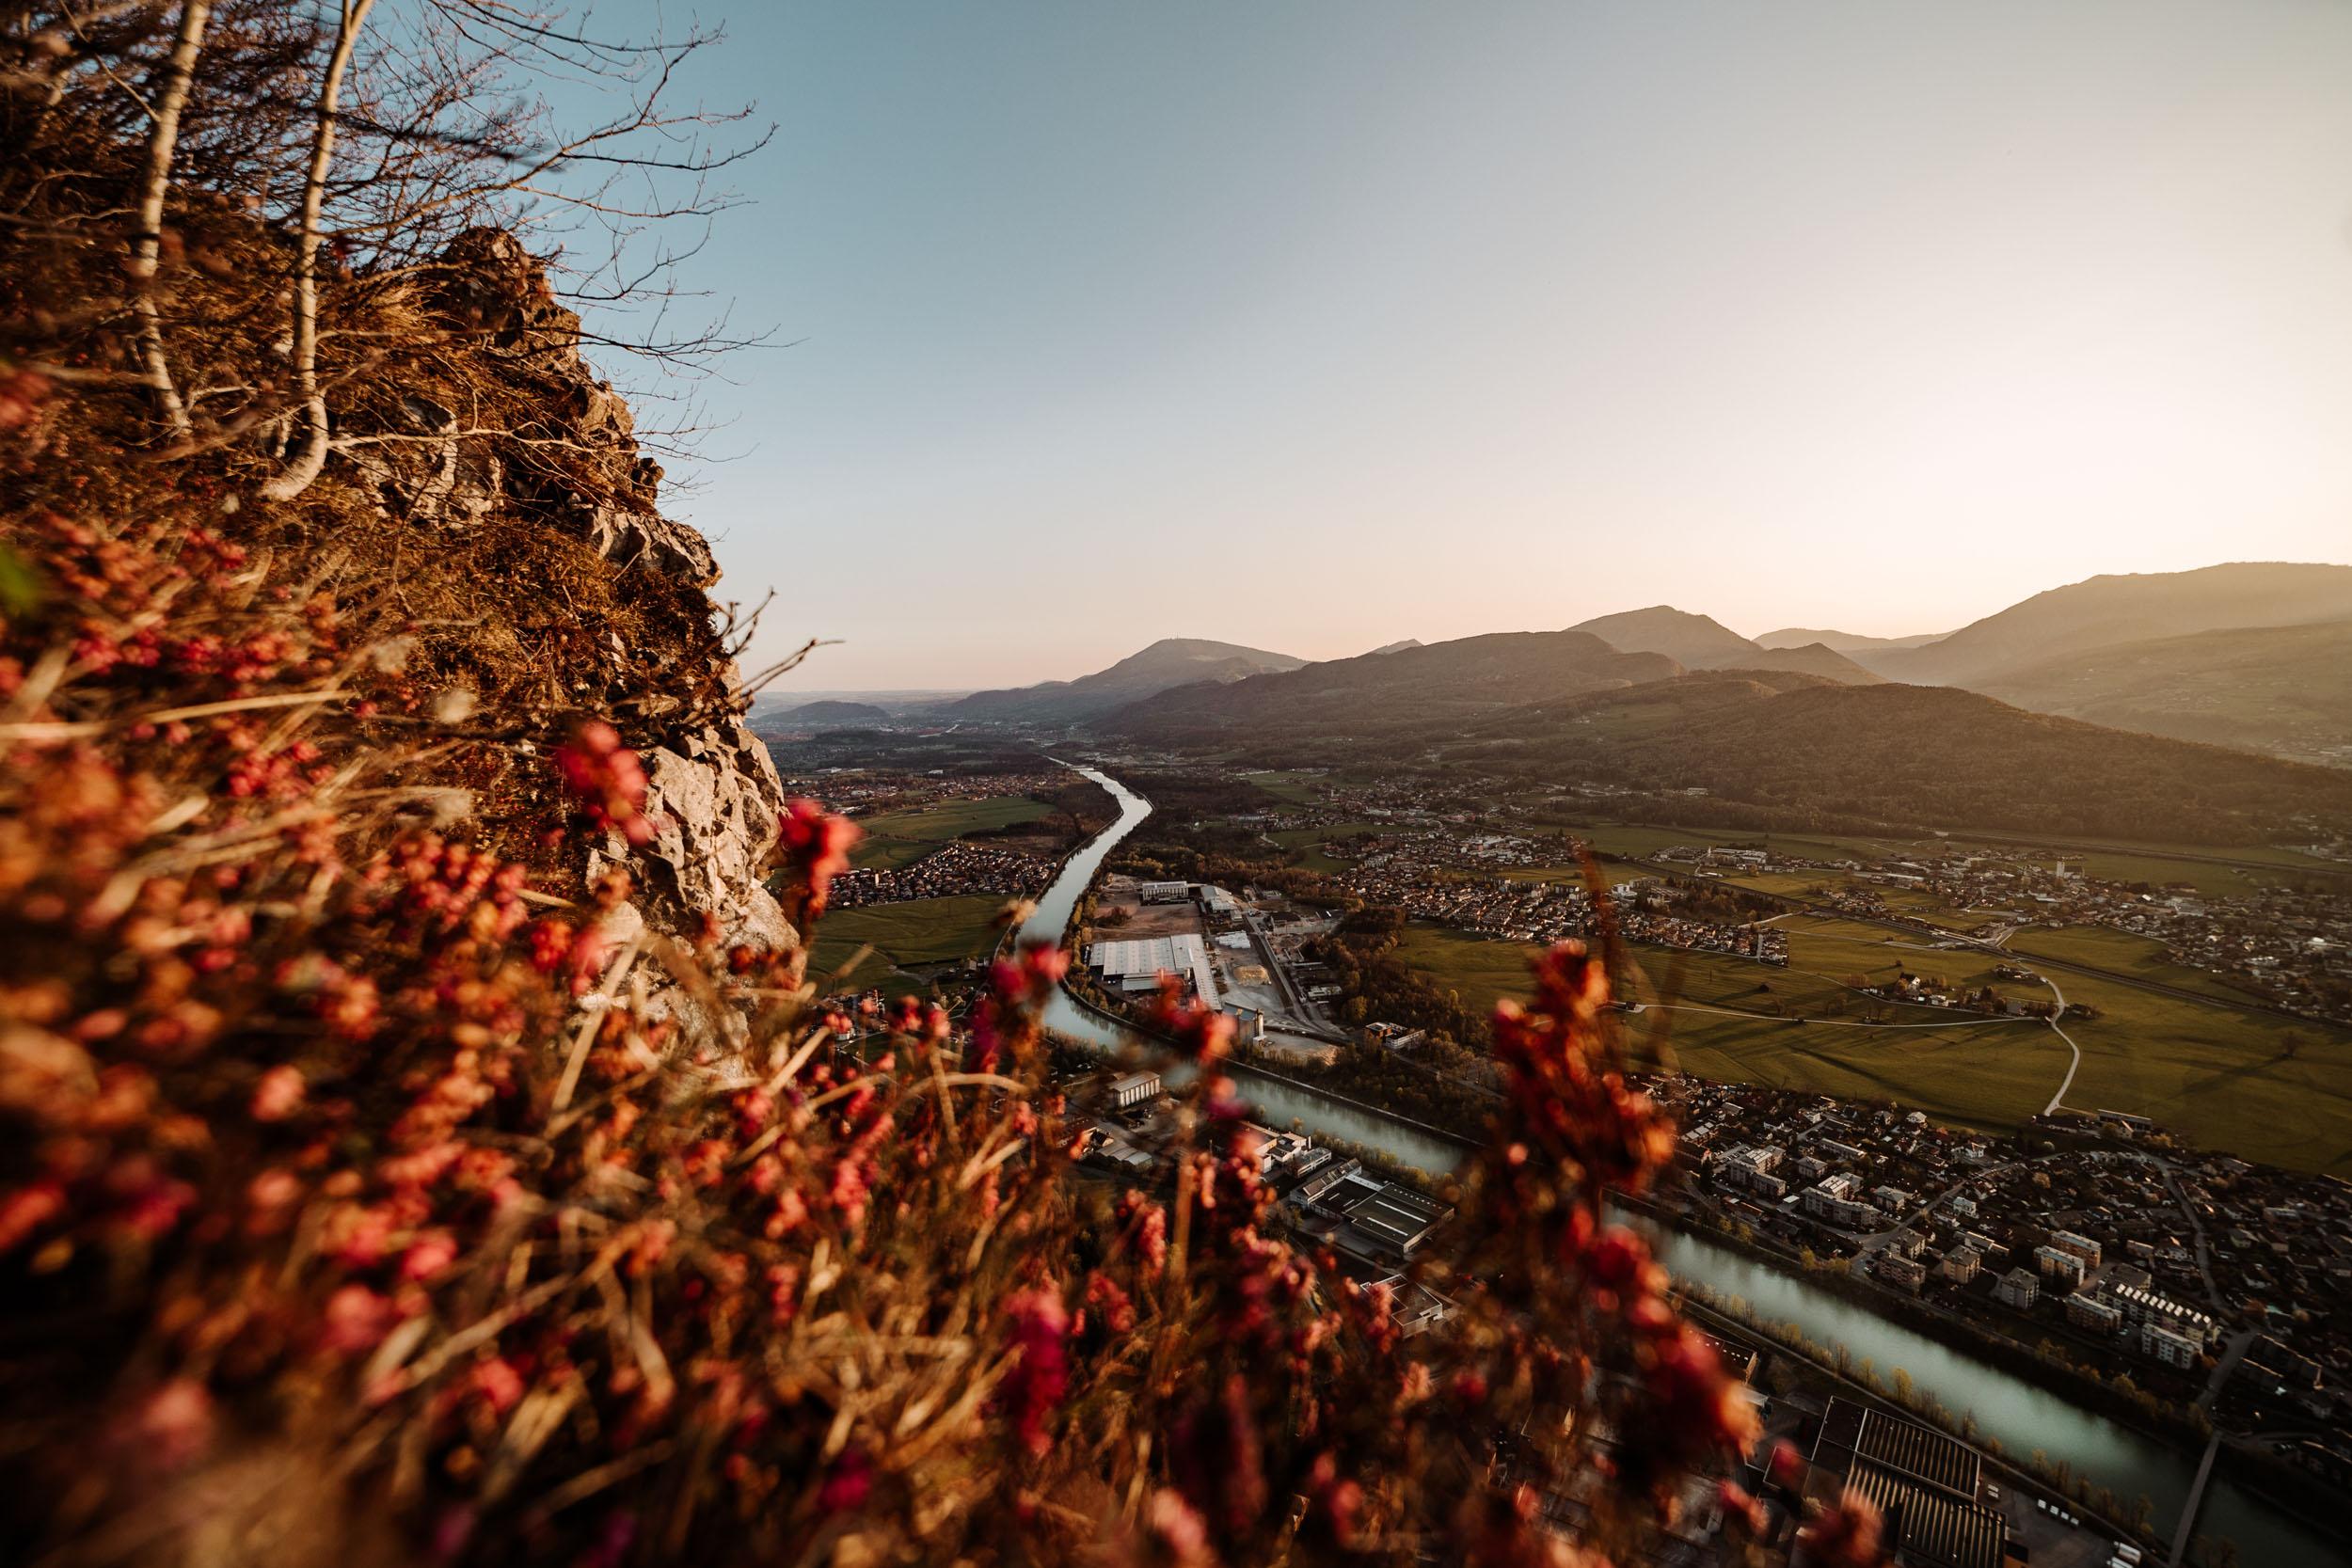 Natur Mood bis Slazburg